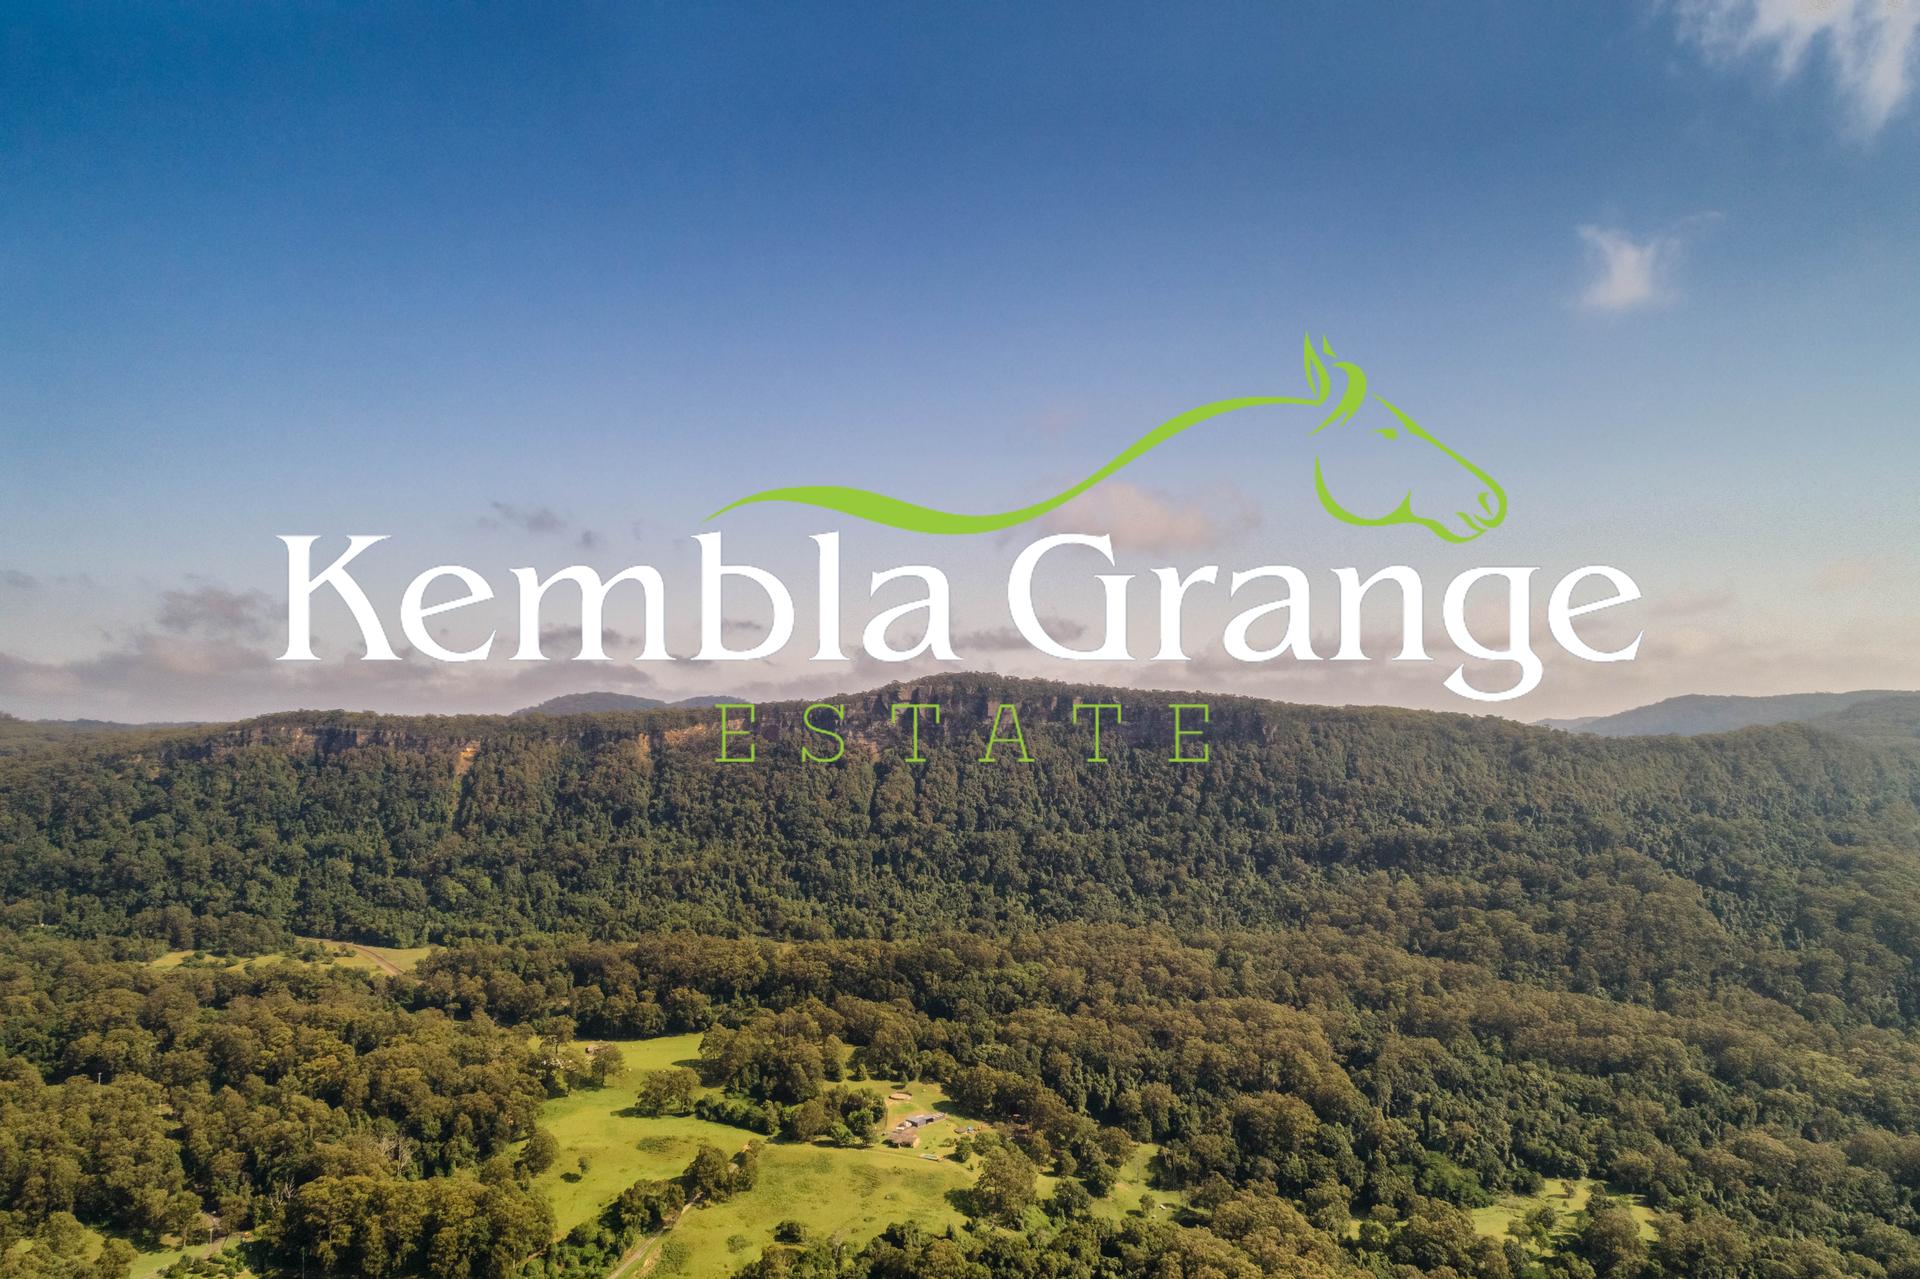 Kembla Grange Kembla Grange Estate Cnr of Paynes & Sheaffes Roads